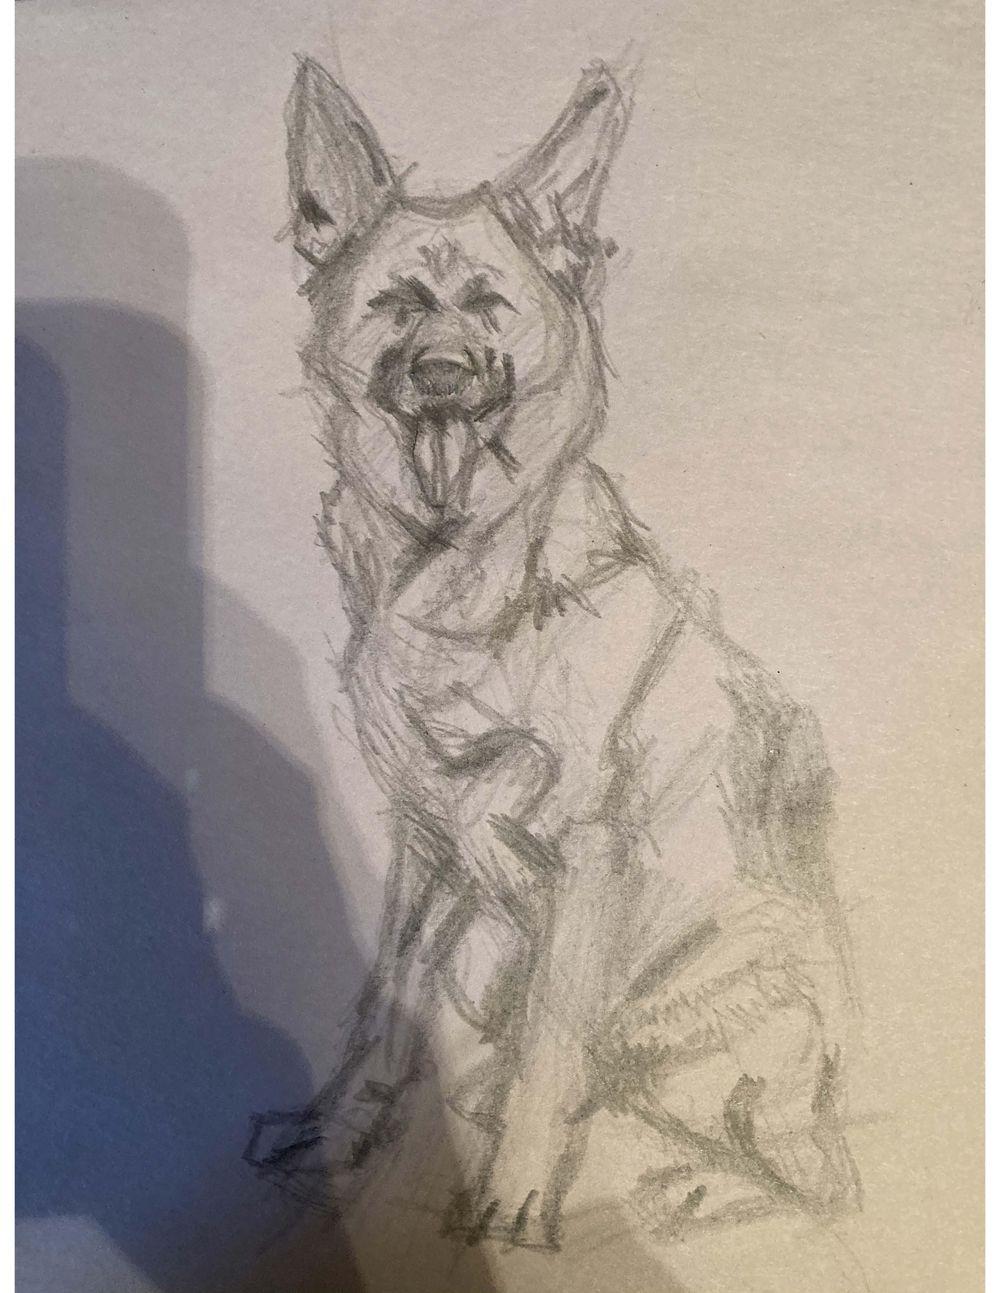 Doggo - image 1 - student project